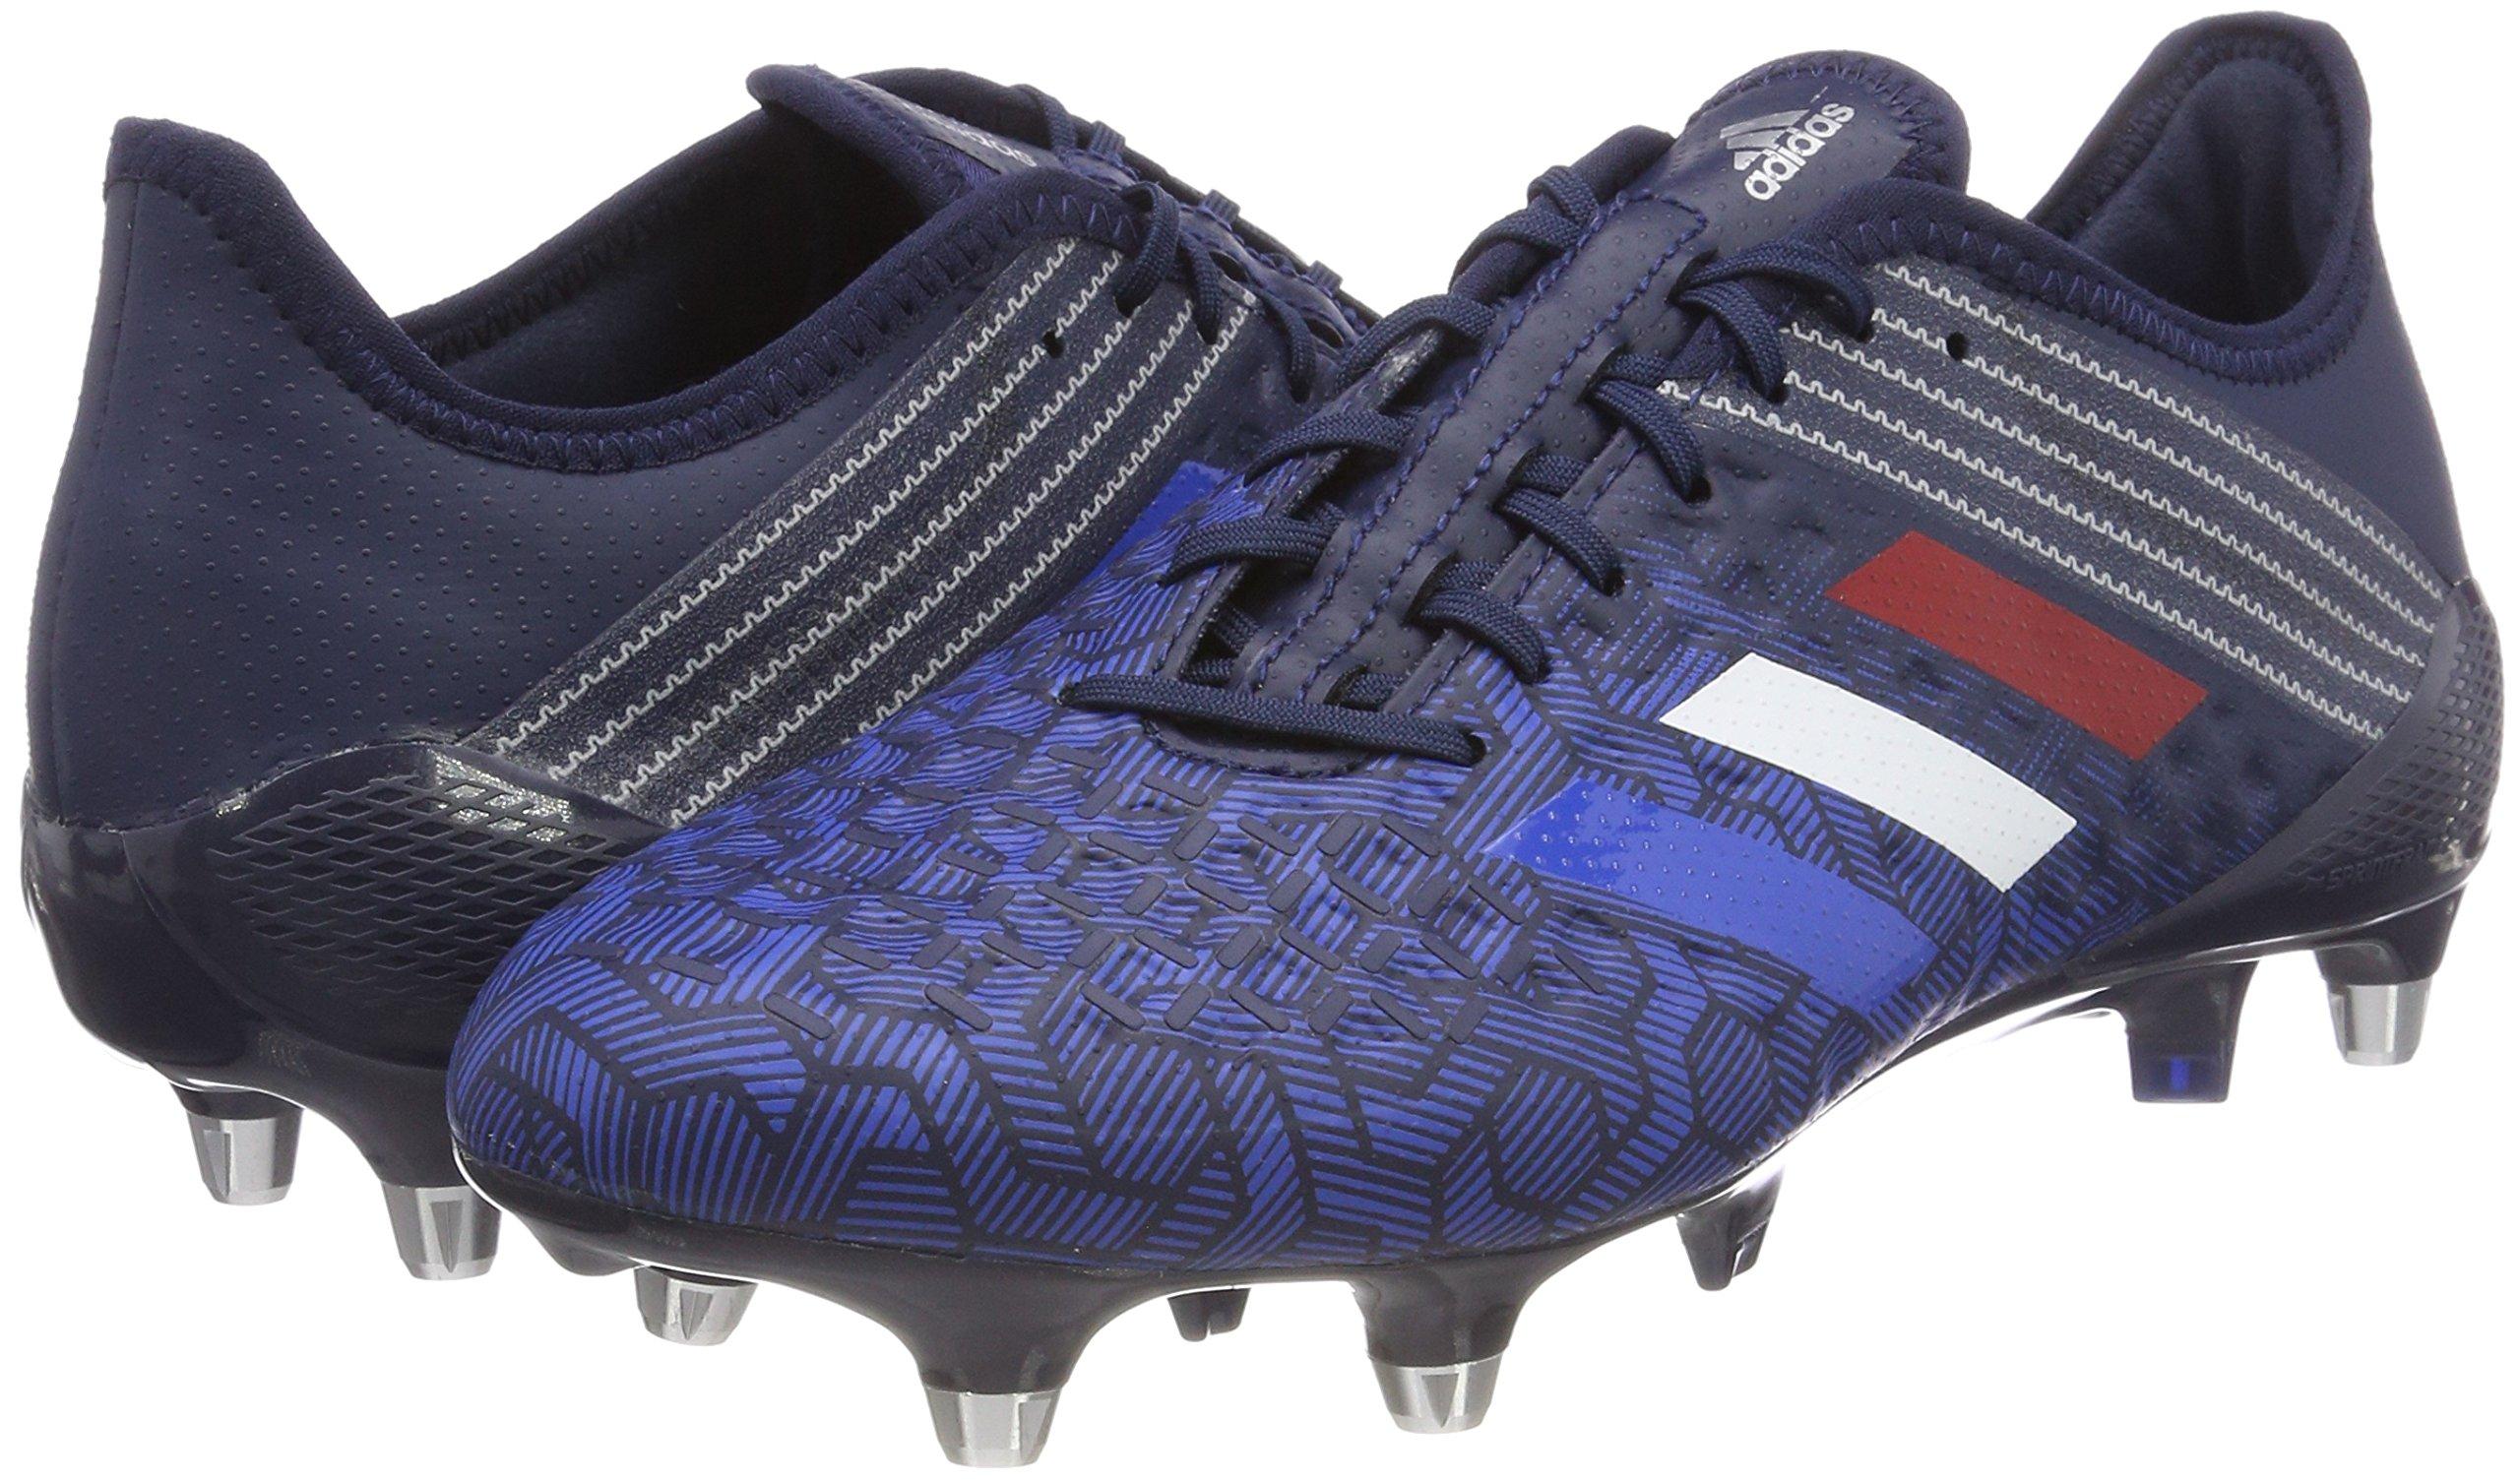 adidas Predator Malice Control (SG), Scarpe da Football Americano Uomo 5 spesavip